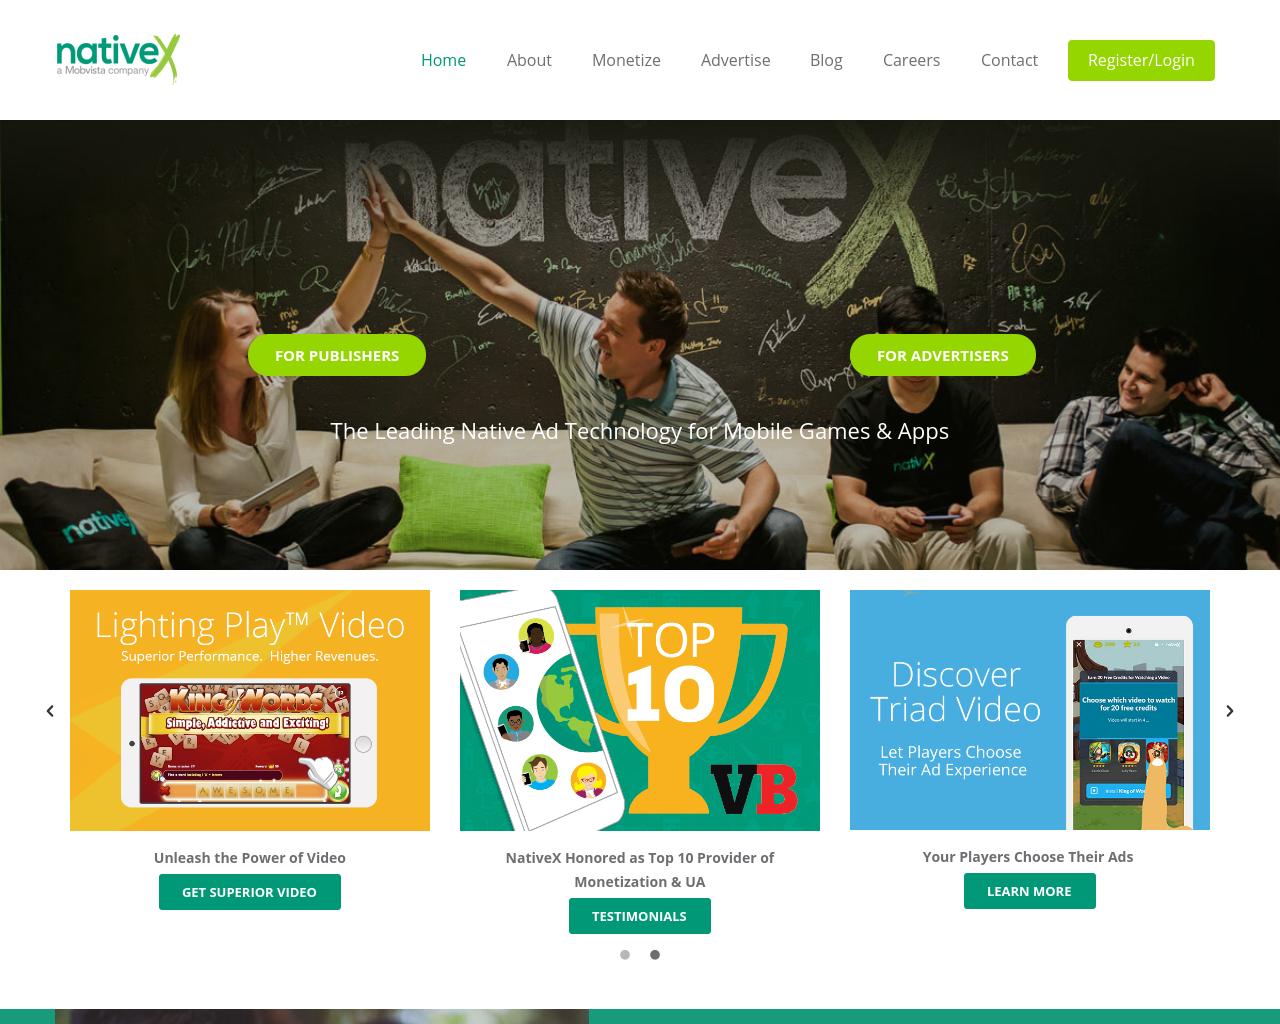 NativeX-Advertising-Reviews-Pricing